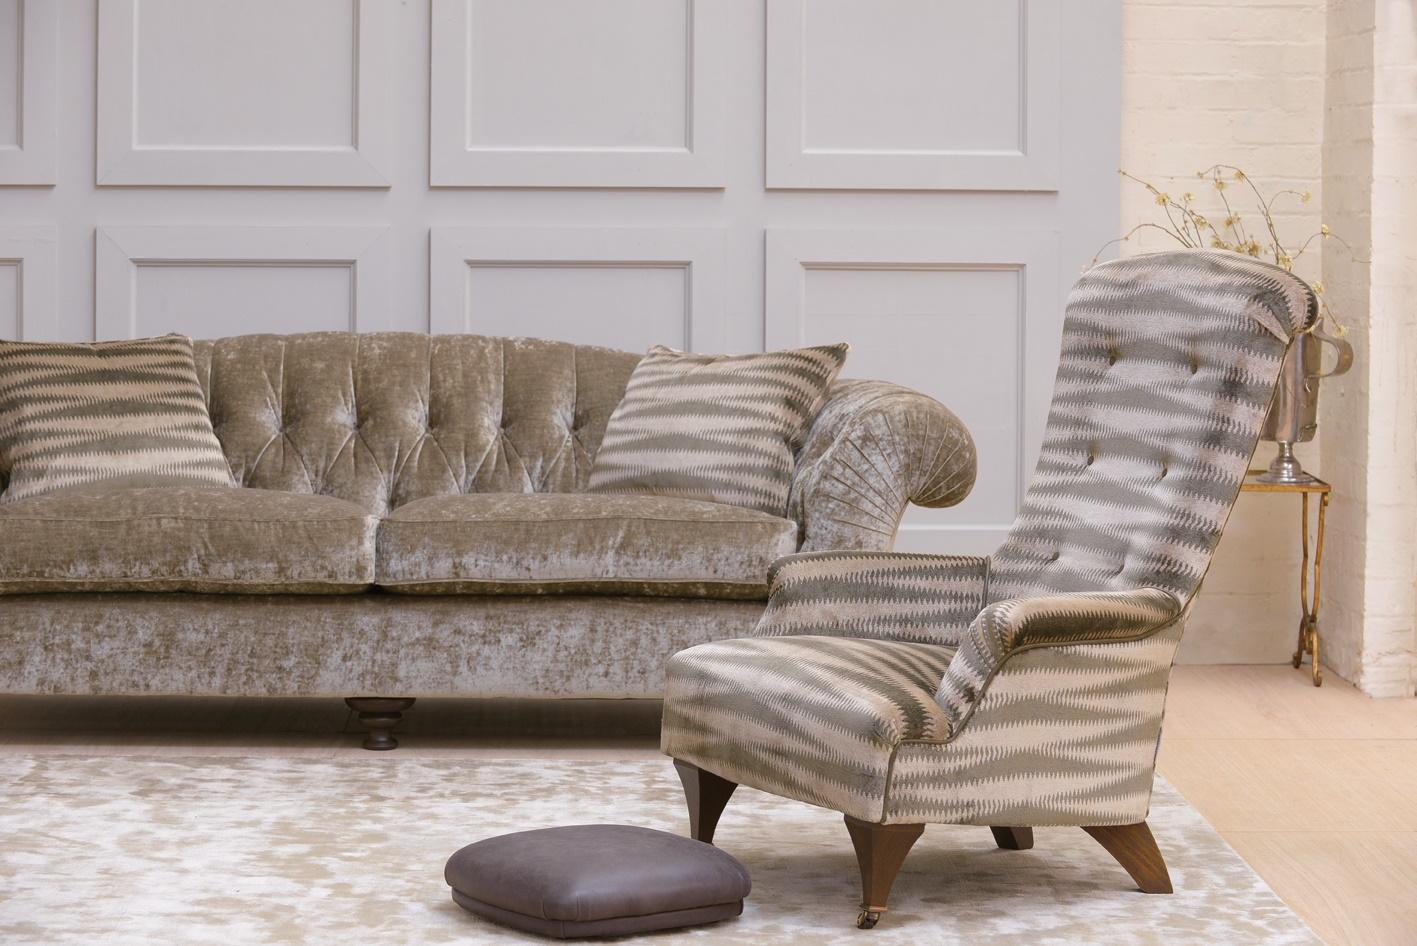 Bloomsbury Sofa and Hawthorne chair